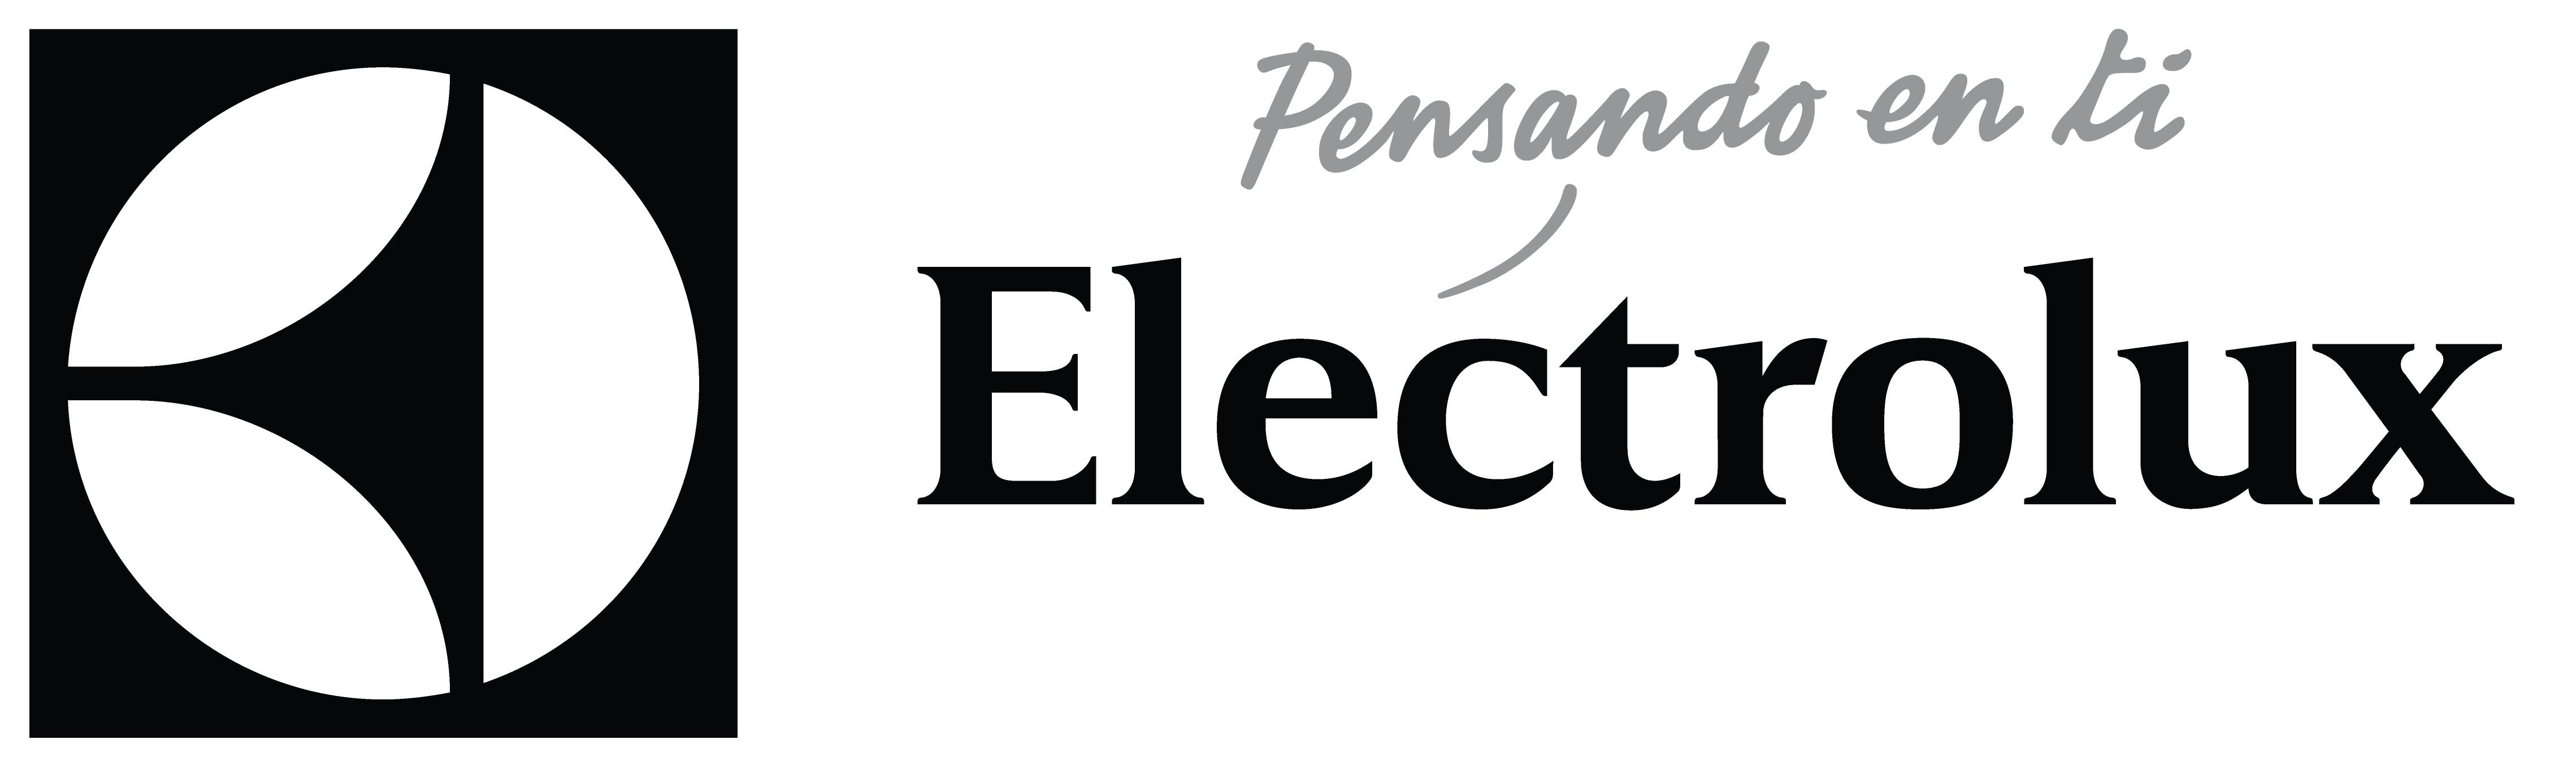 logo_electrolux_2011_pensandoenti New